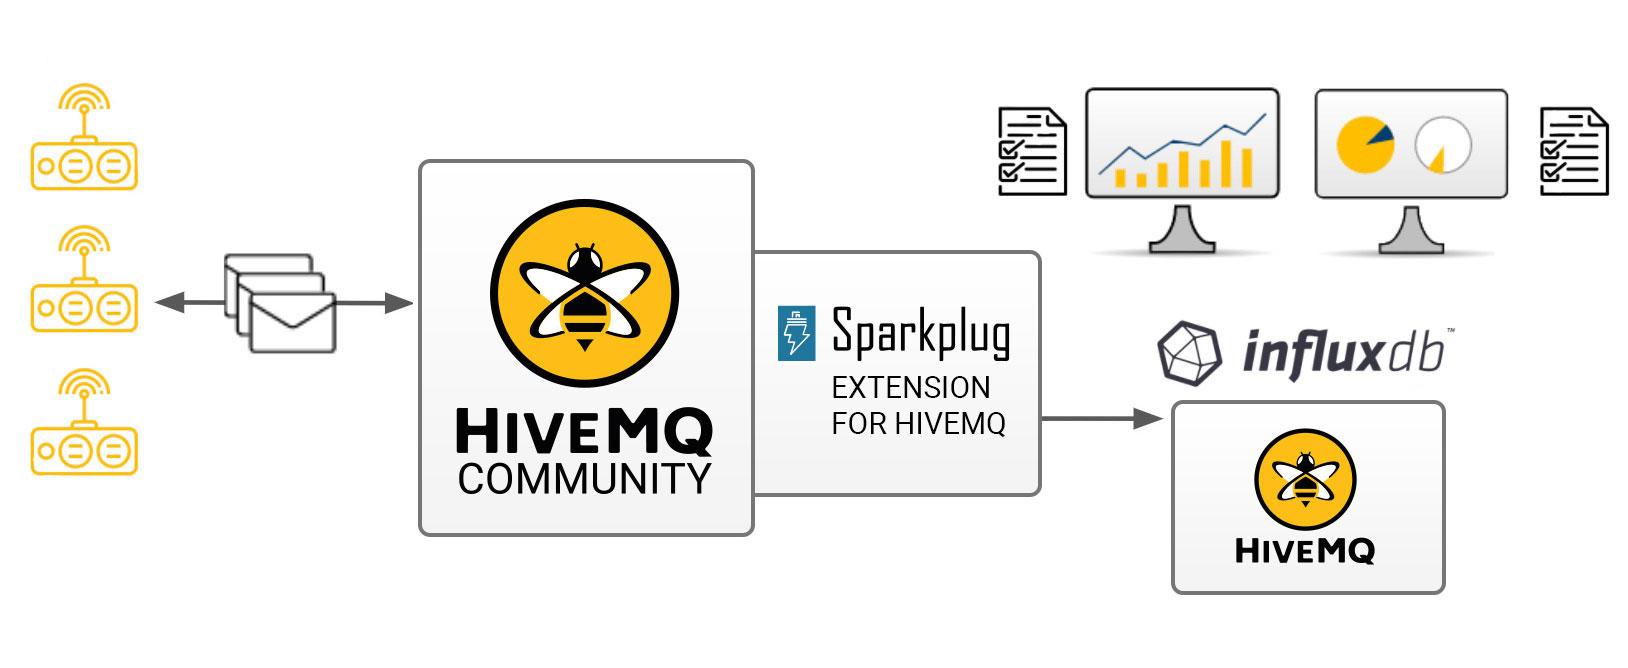 Sparkplug Extension for HiveMQ